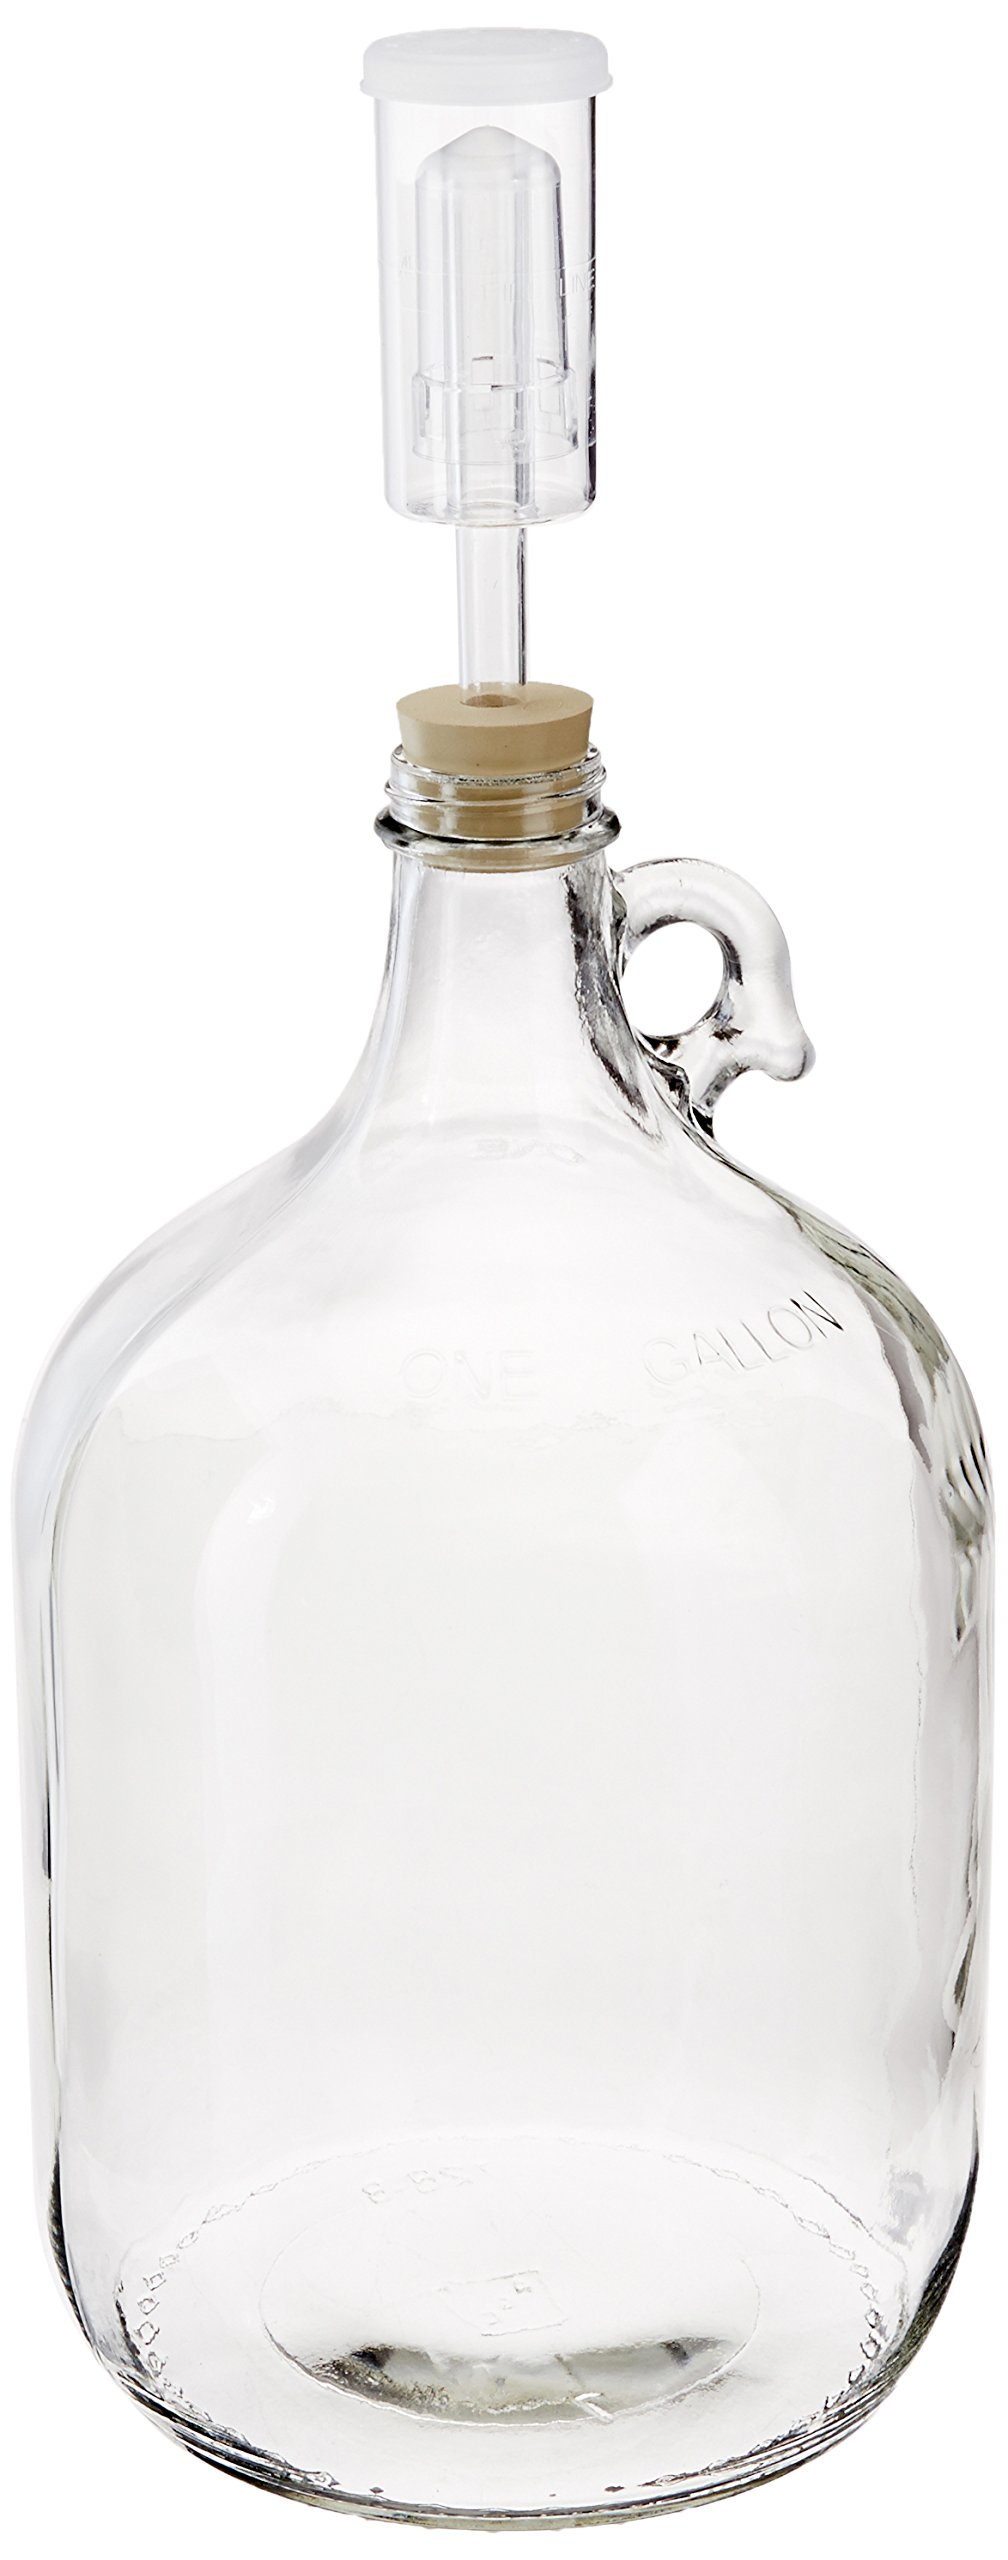 Home Brew Ohio Glass Wine Fermenter Includes Rubber Stopper and Airlock, 1 gallon Capacity by Home Brew Ohio